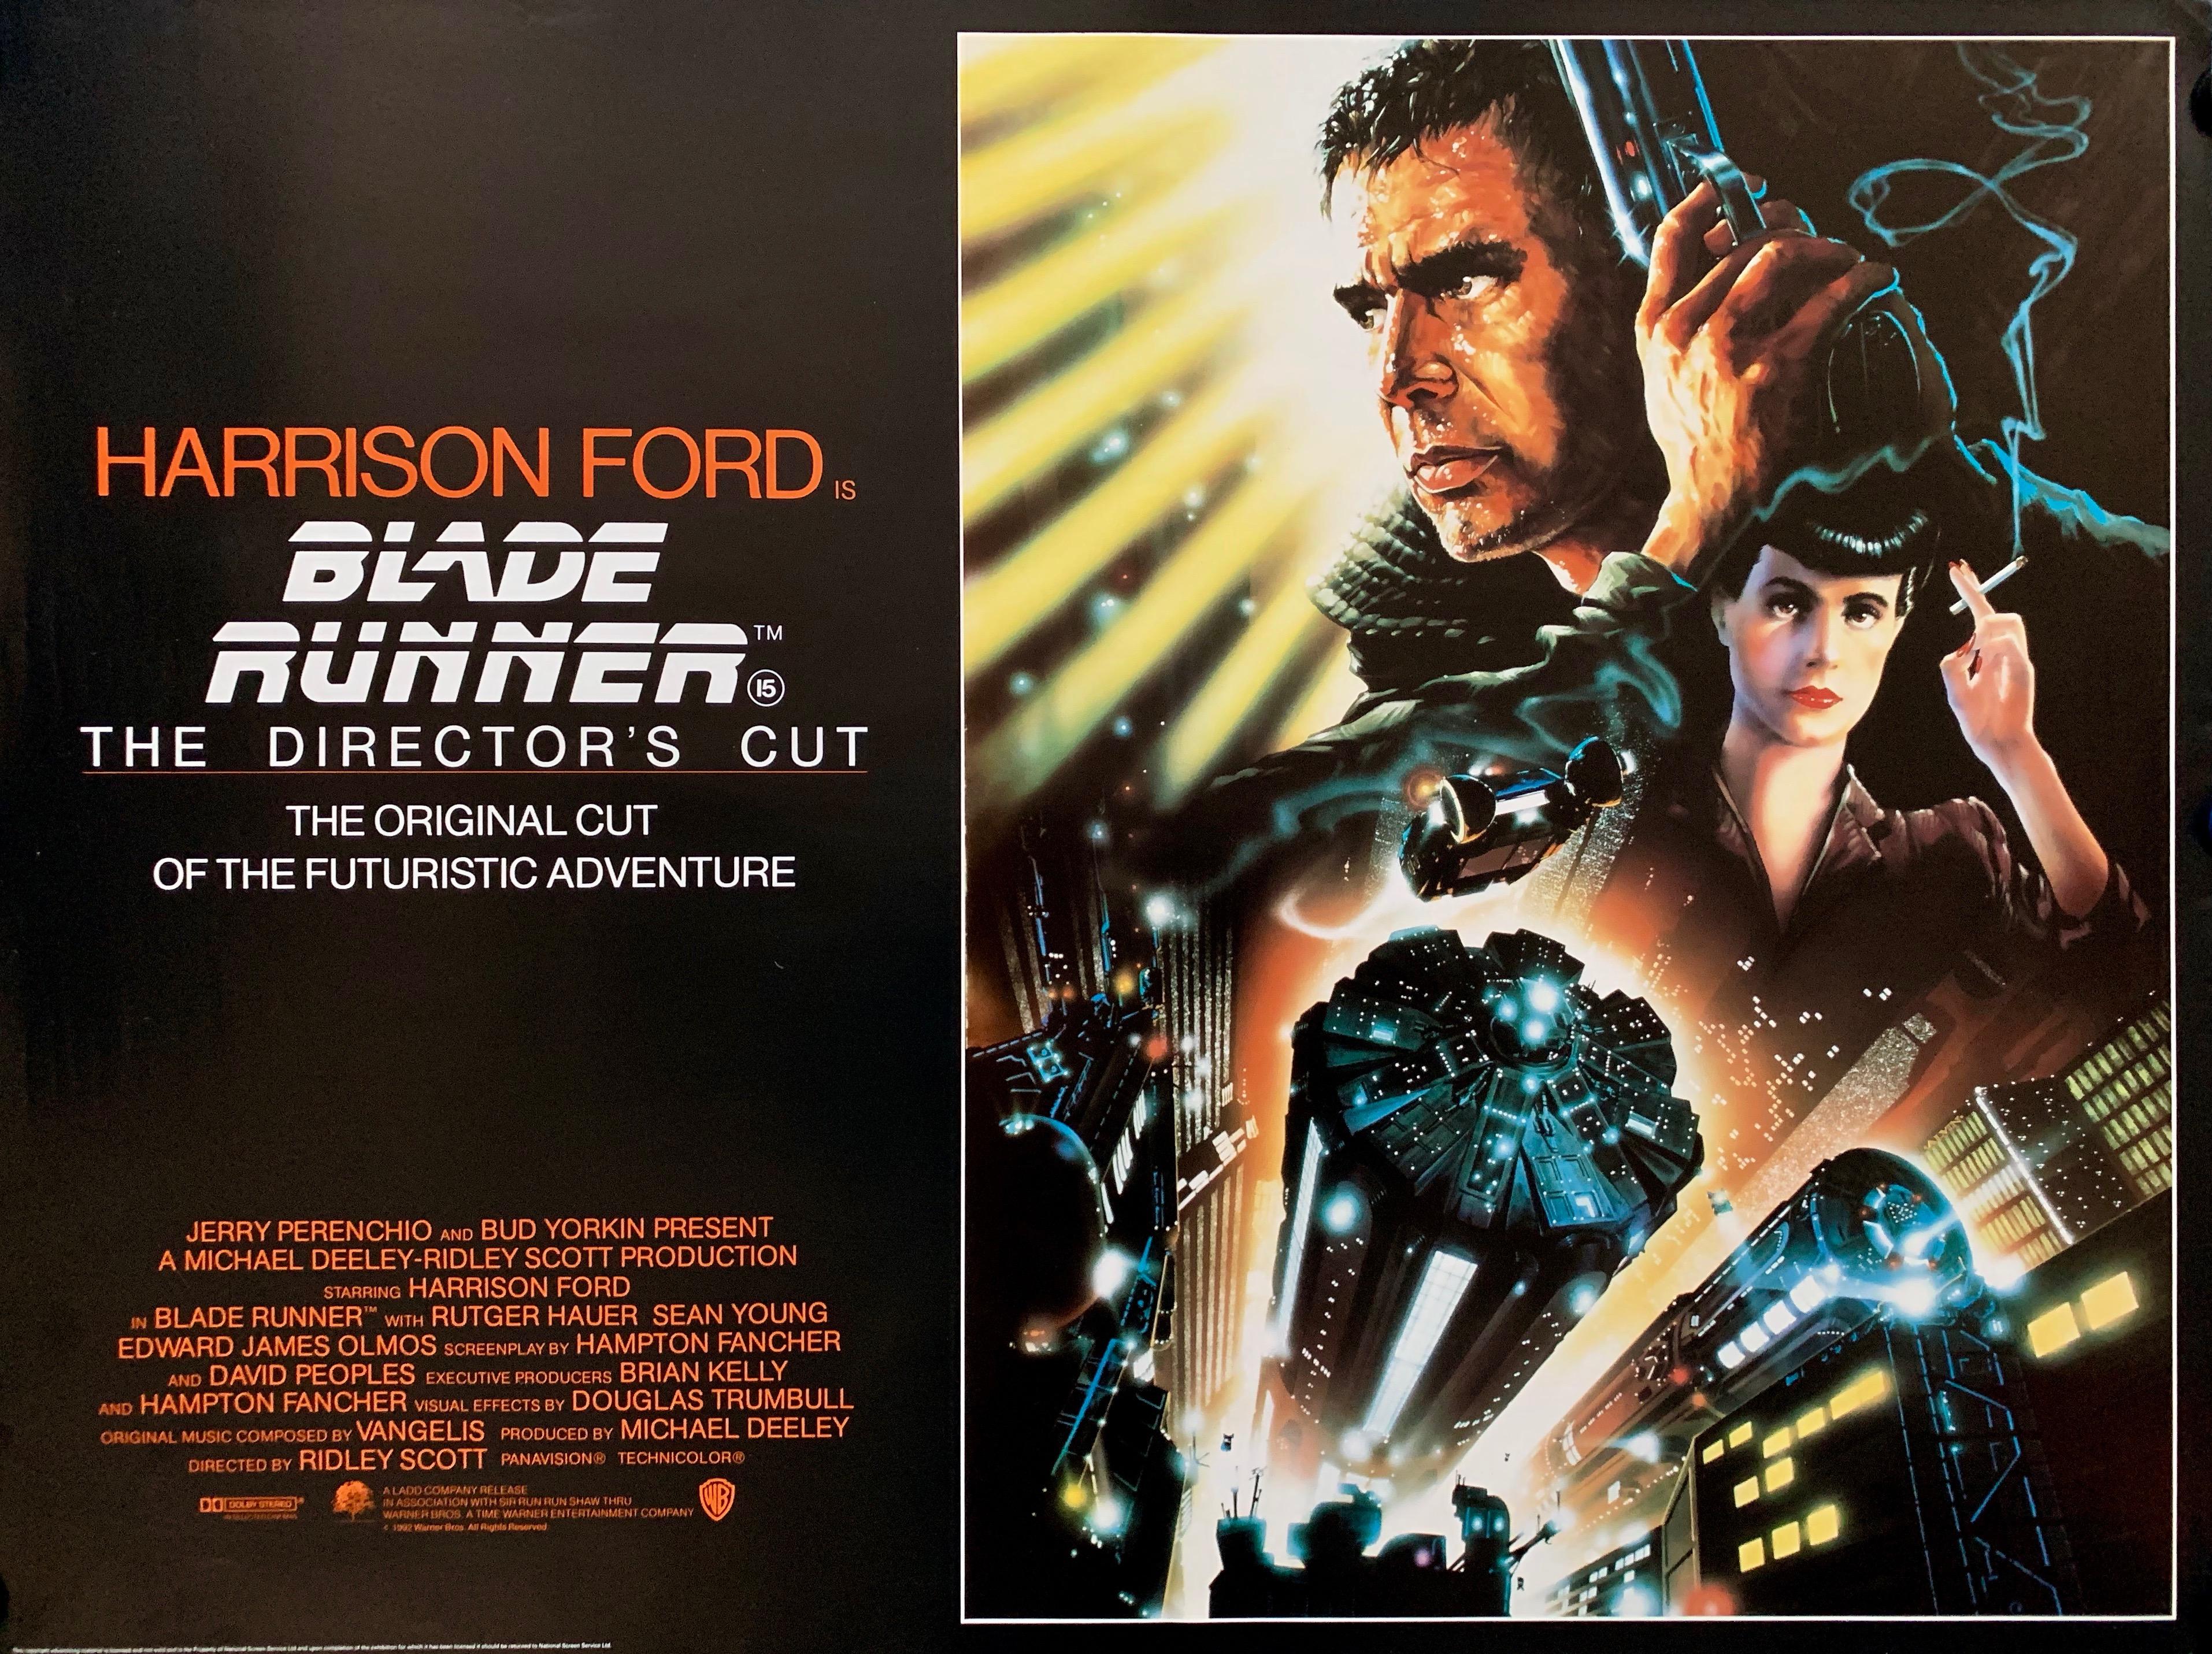 Original Blade Runner: The Director's Cut Movie Poster - Ridley Scott